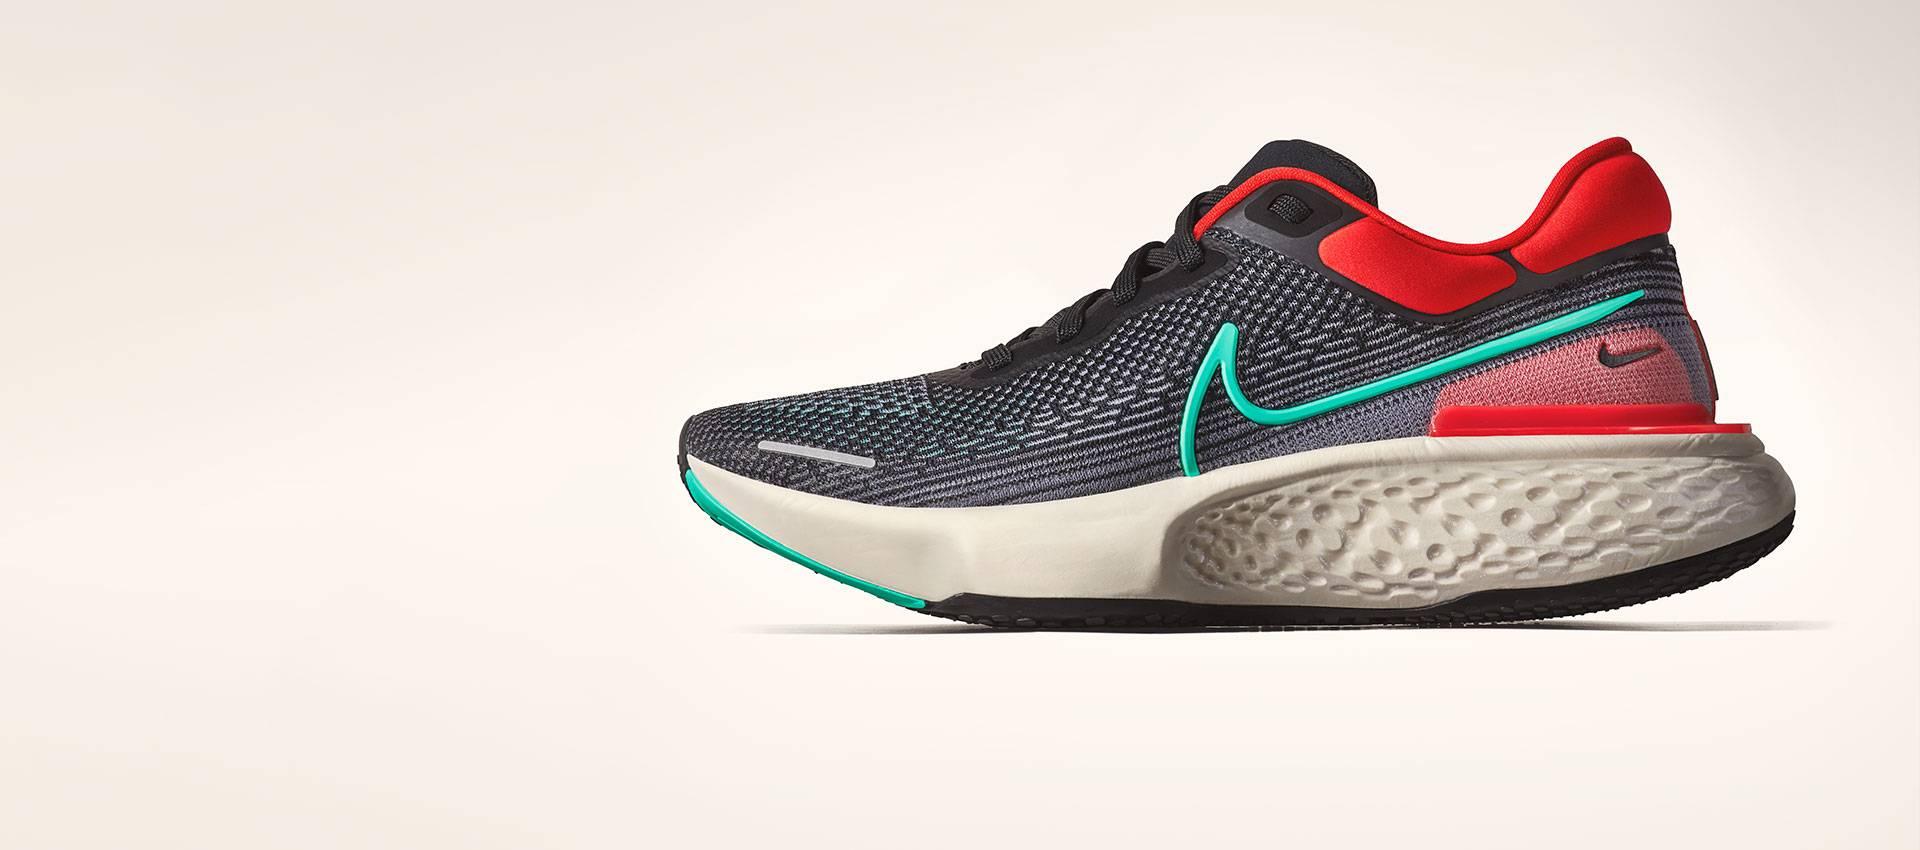 Zapatillas Nike Invincible ZoomX